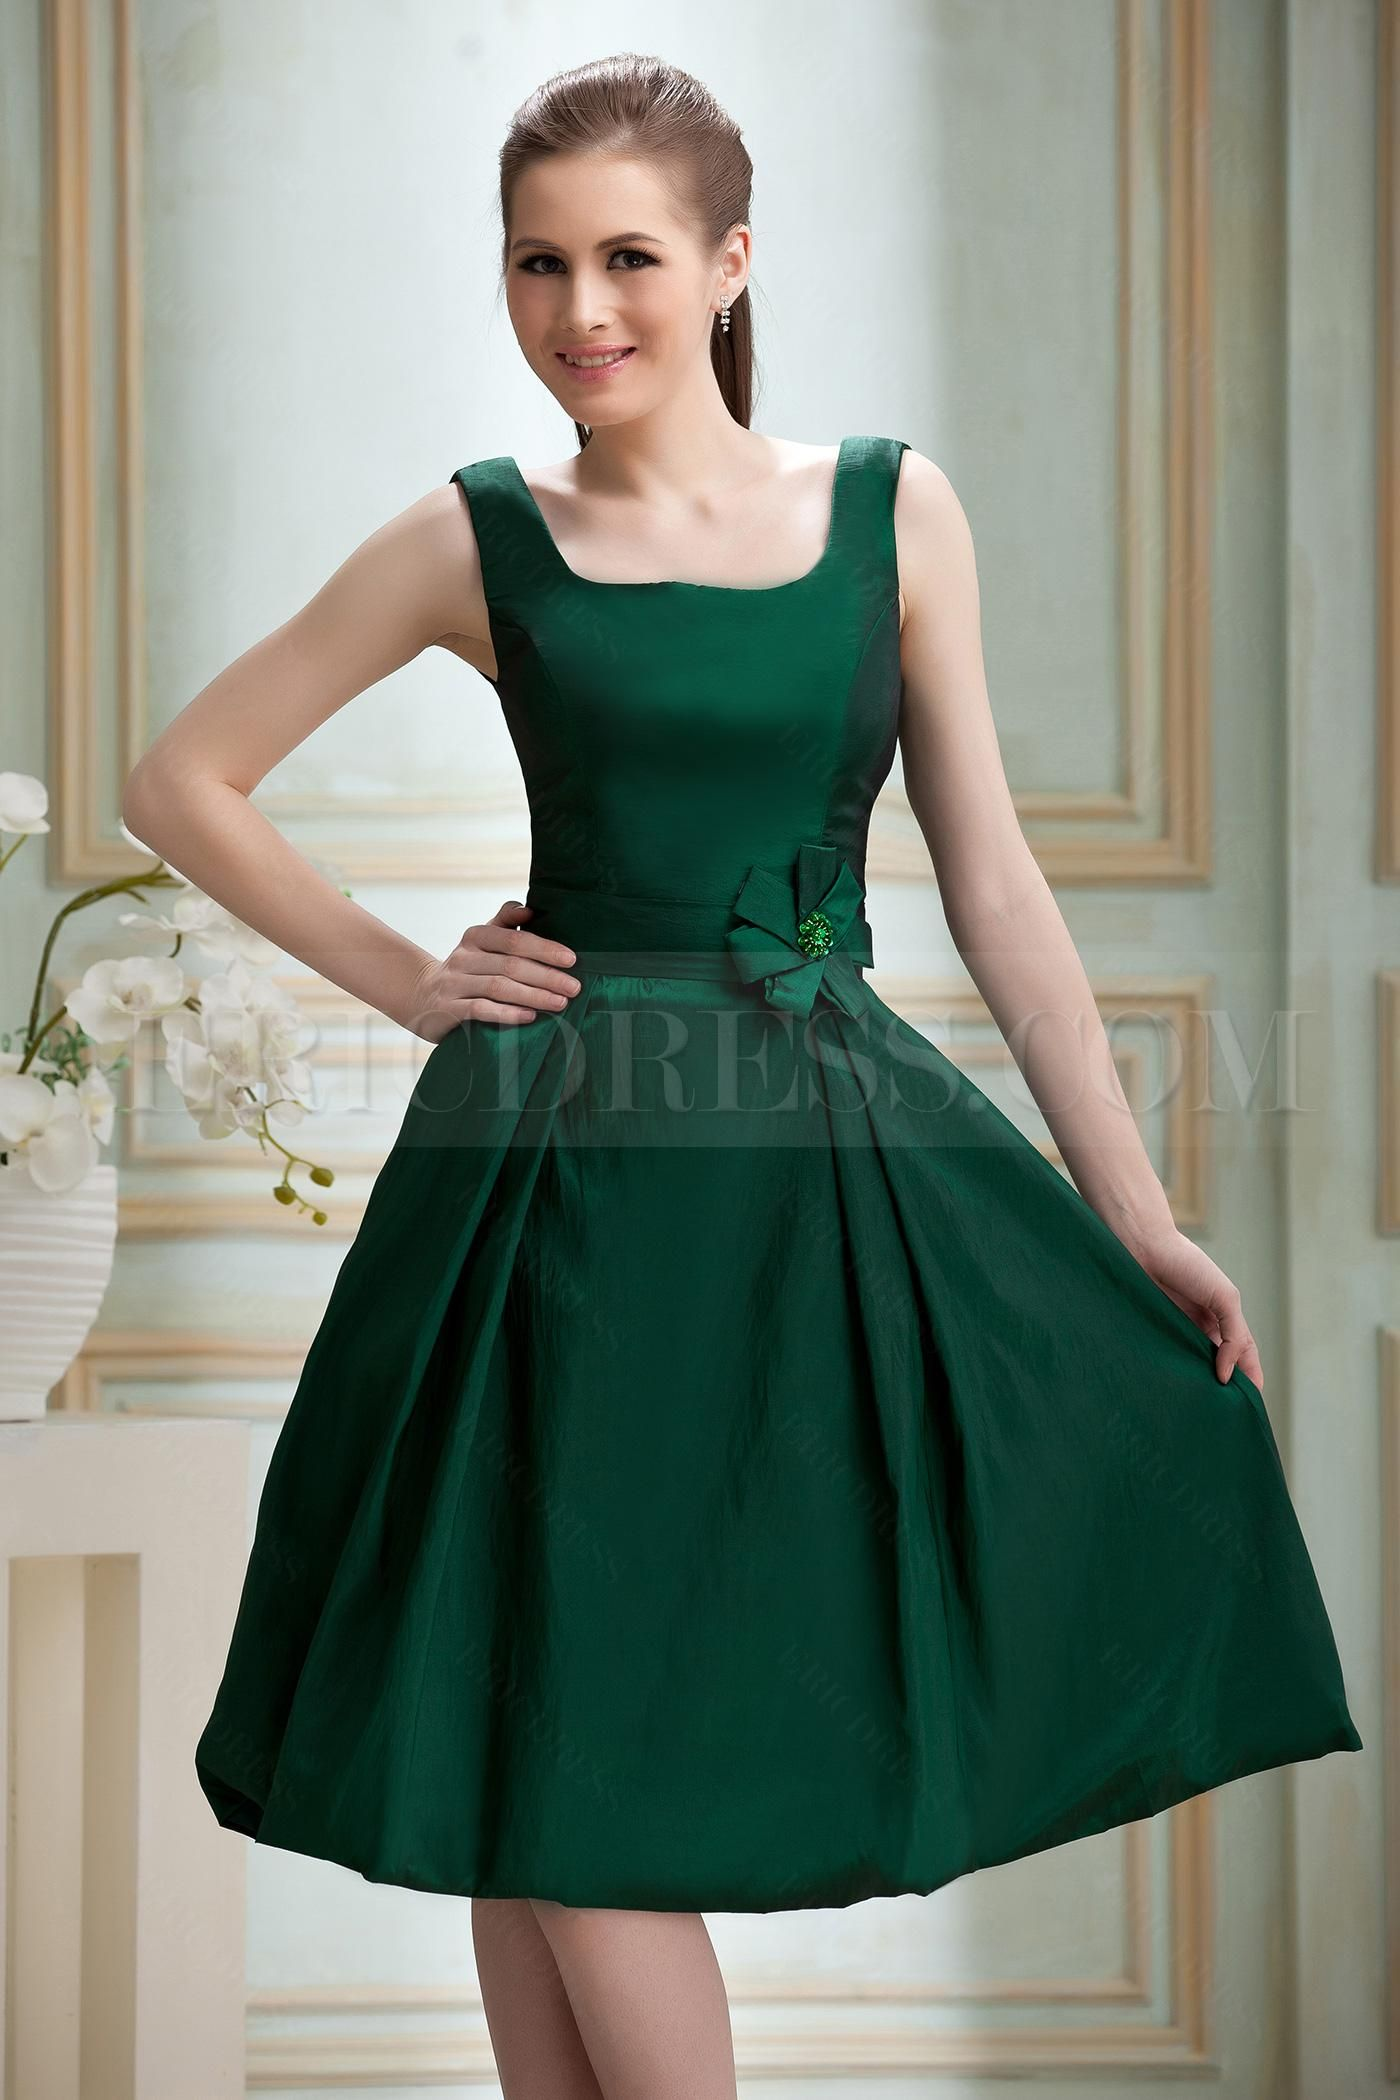 Hunter Green Short Sequin Lace Wedding Guest Dress Lace Wedding Guest Dress Guest Dresses Green Wedding Dresses [ 1666 x 1000 Pixel ]